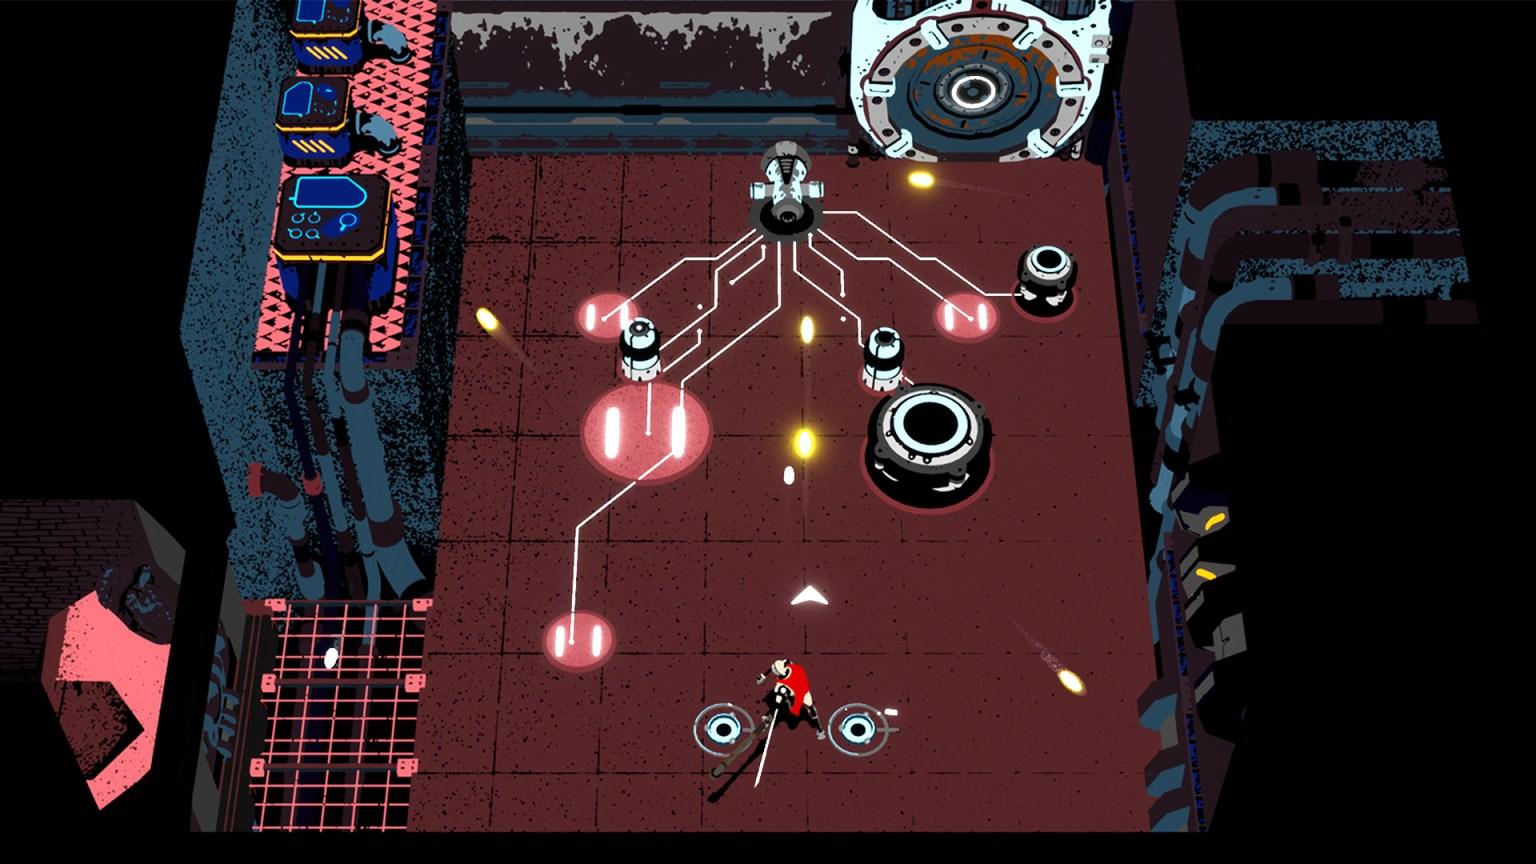 Слэшер с элементами пинбола Creature in the Well выйдет на PS4 creature in the well,ps,Игры,релизы